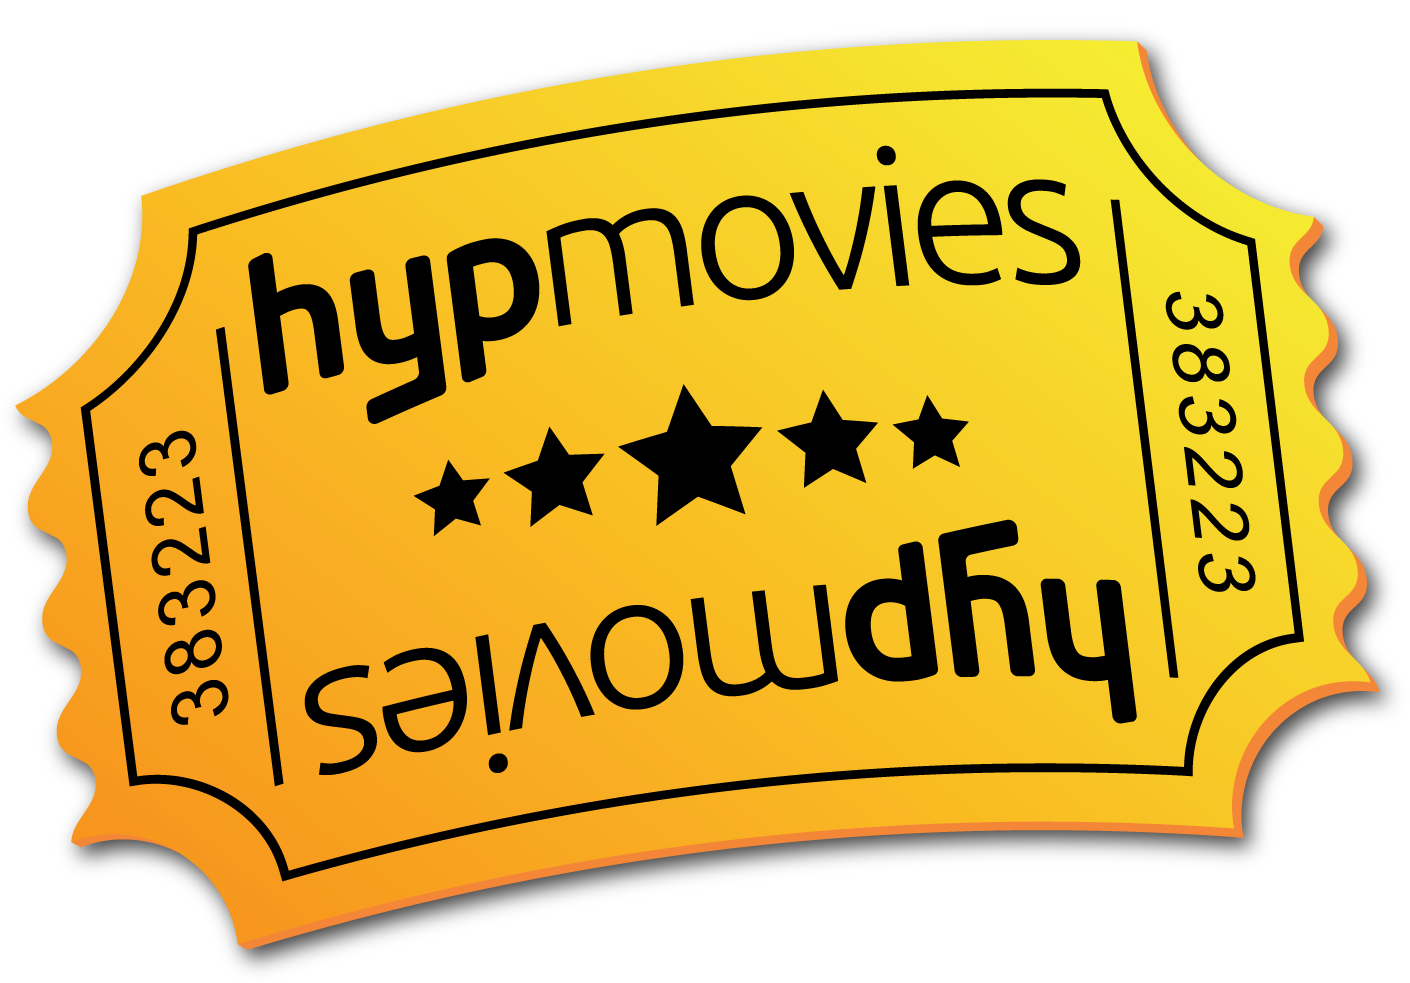 HypMovies